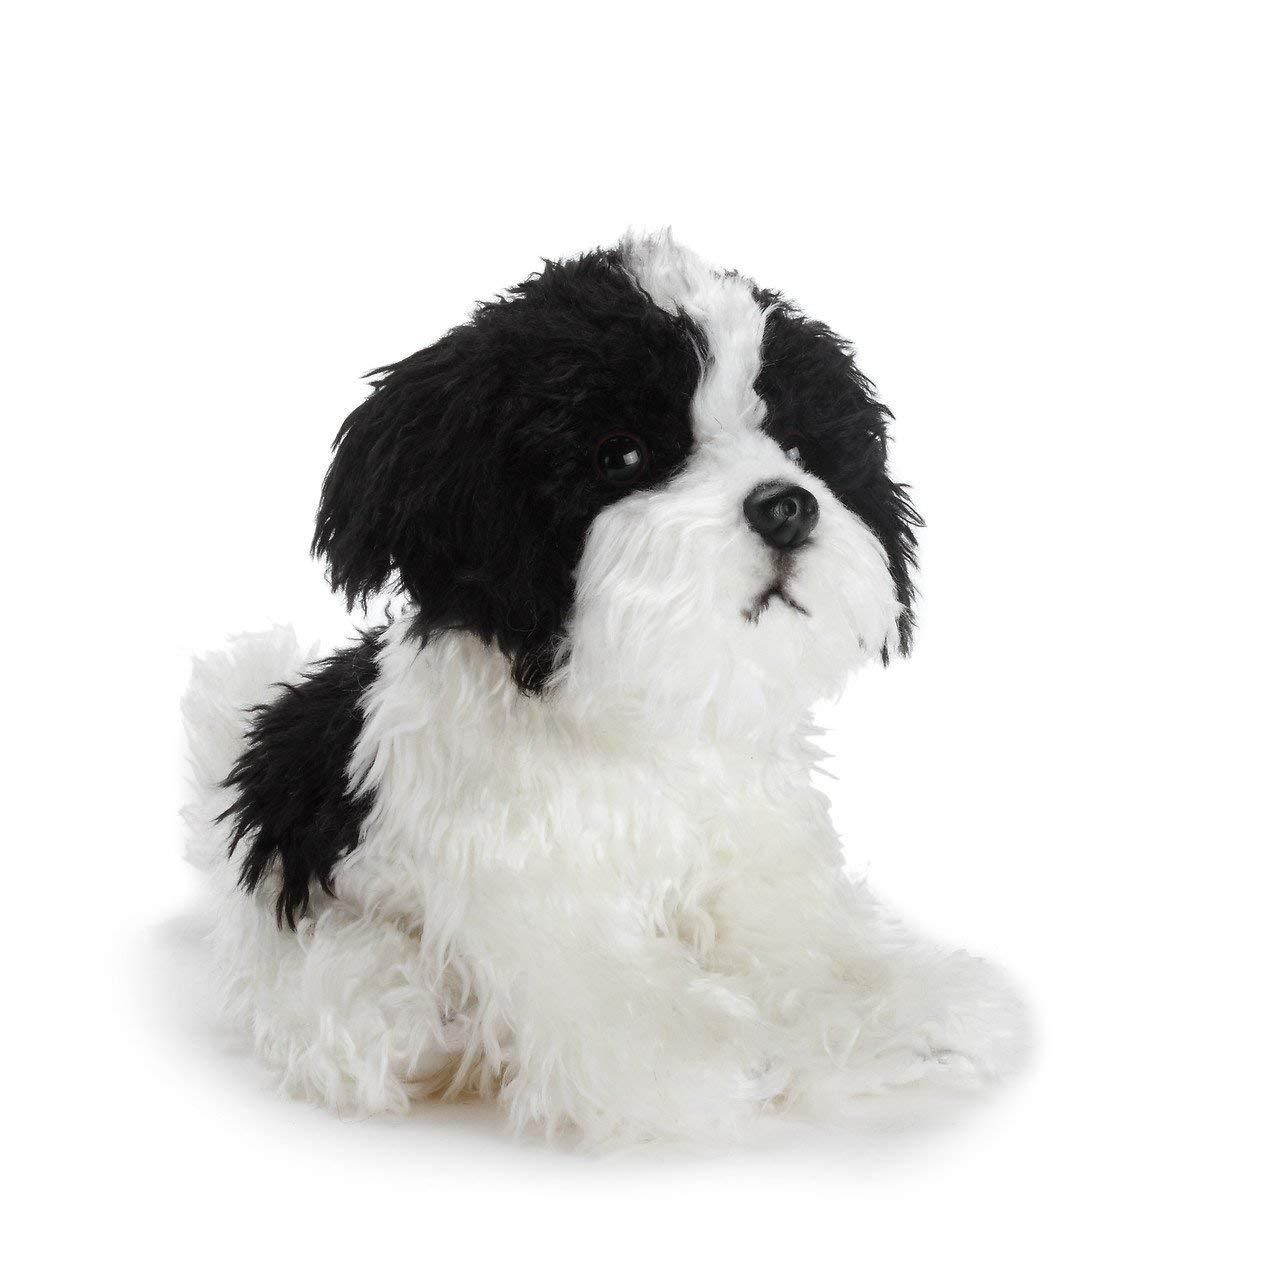 Amazon Com Demdaco Sitting Small Havanese Dog Black And White